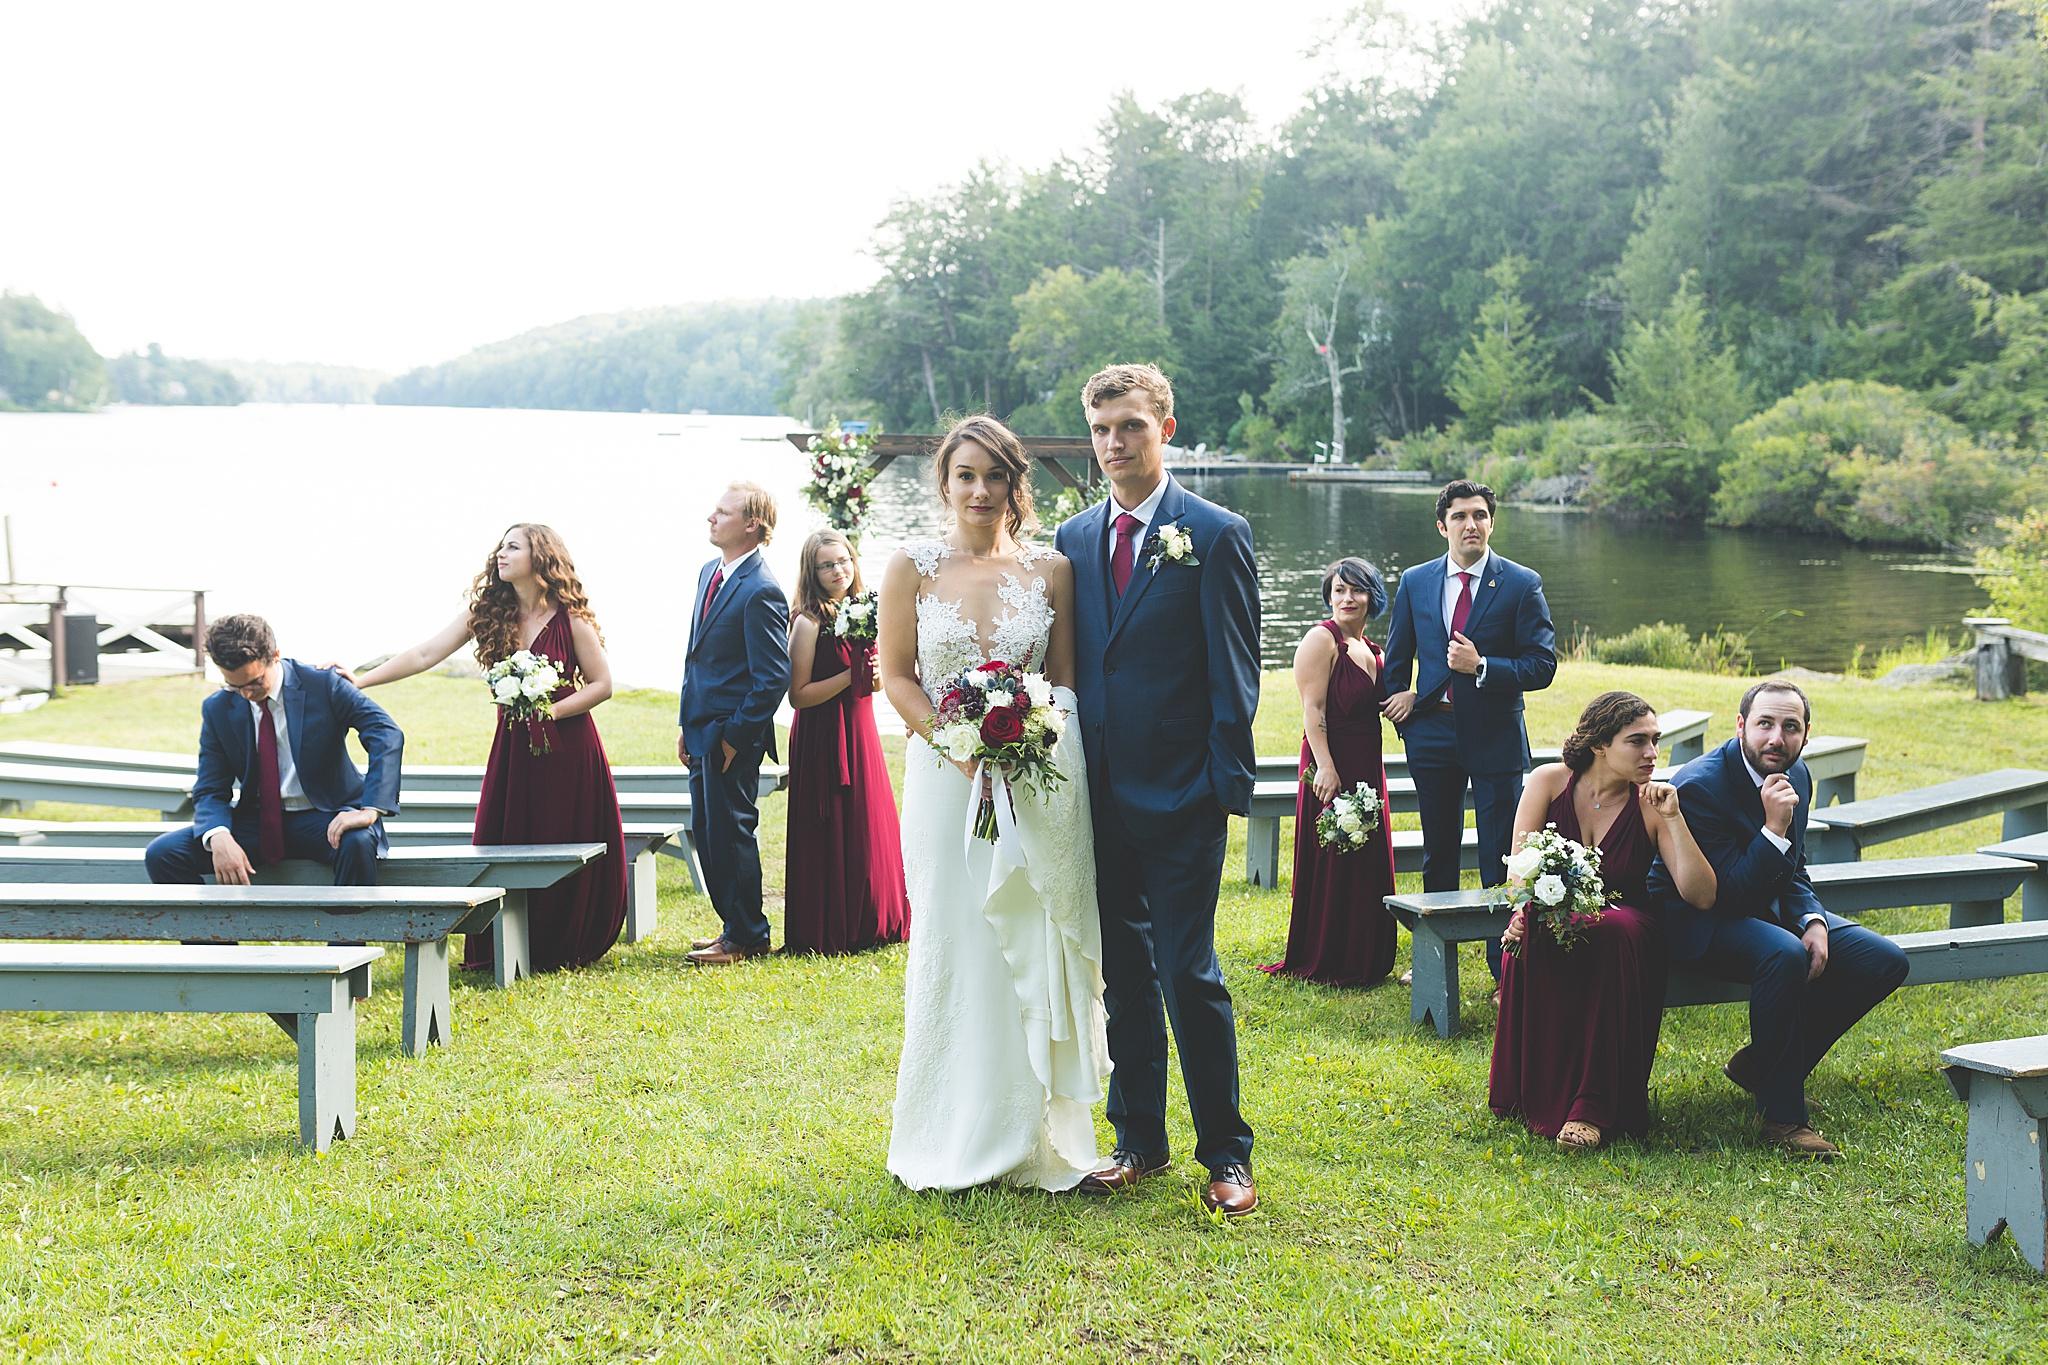 Albany_Wedding_Photographer_7506.jpg